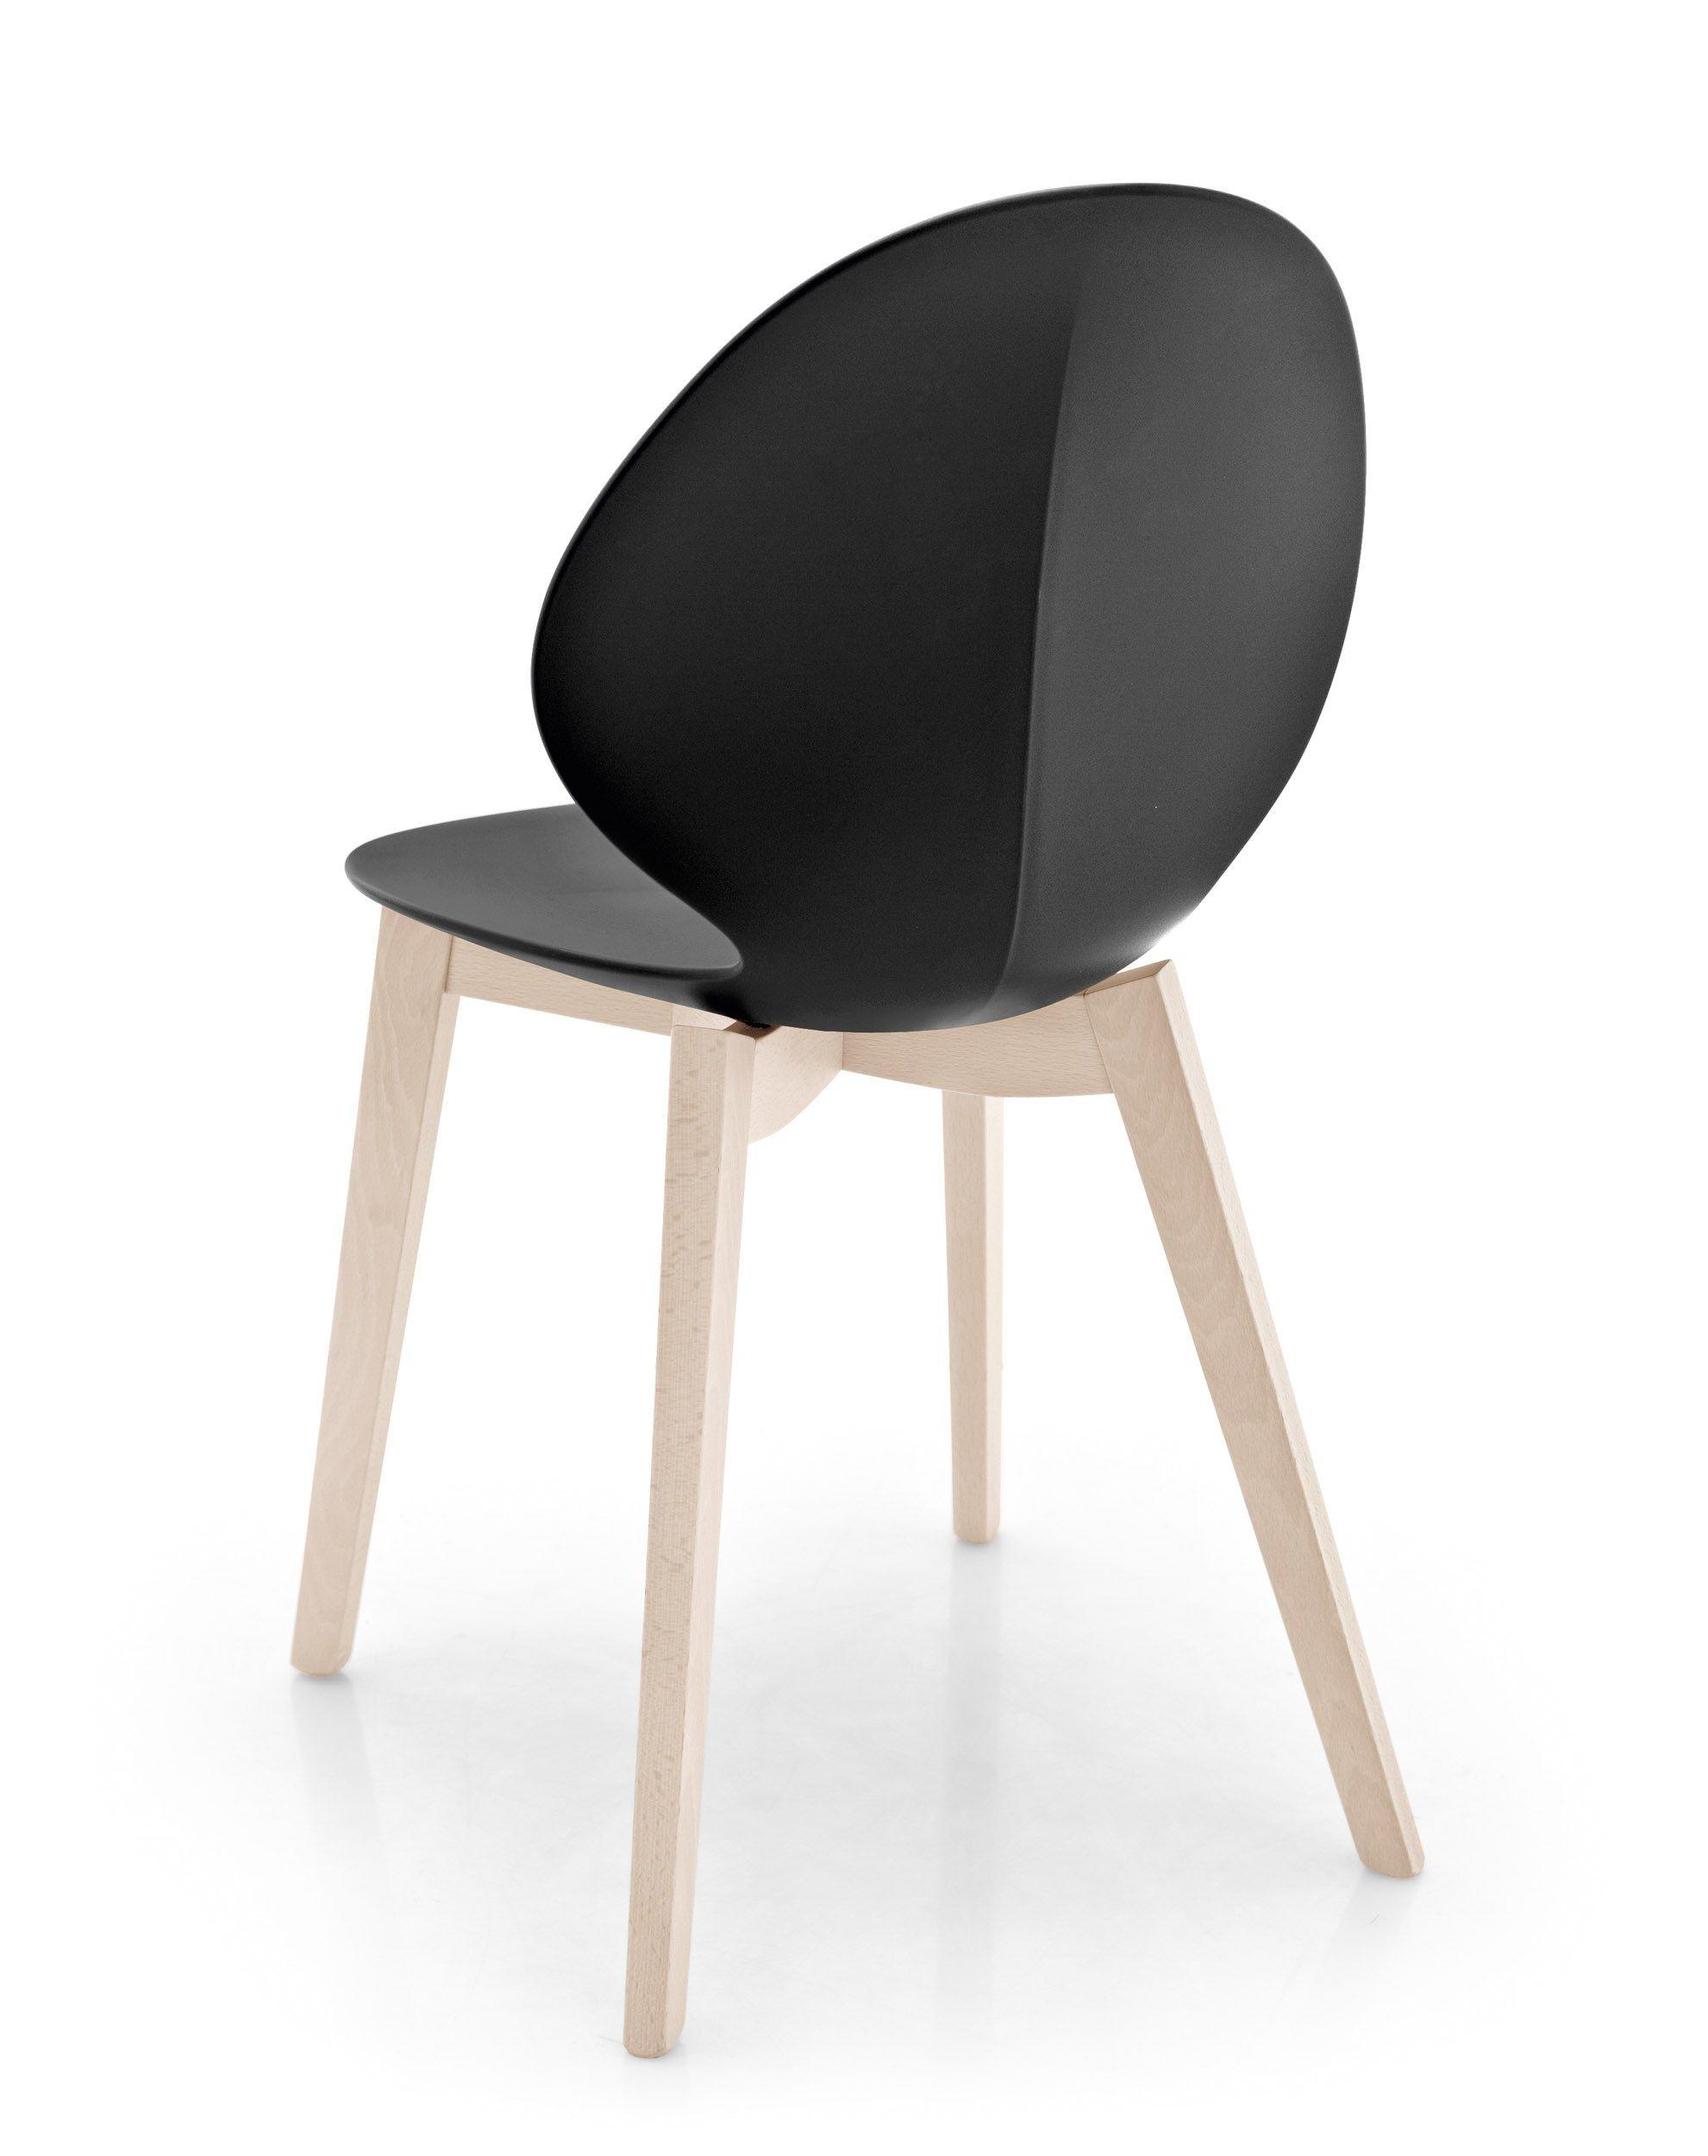 Basil Plastic Chair By Calligaris Design Mr Smith Studio S T C Plastic Chair Calligaris Chair